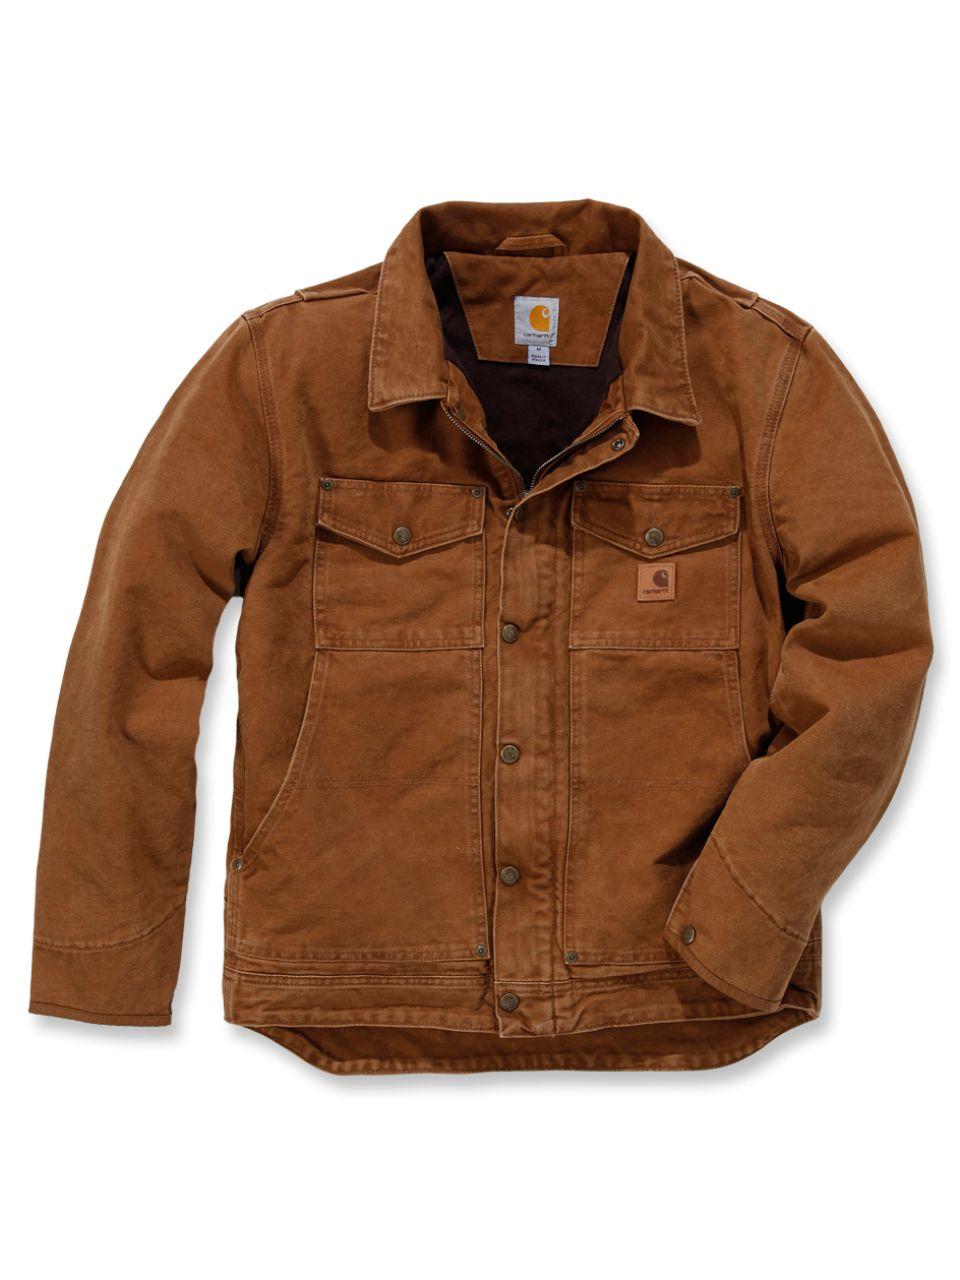 Carhartt Sandstone Berwick Jacket in Braun | Jacken, Rugged